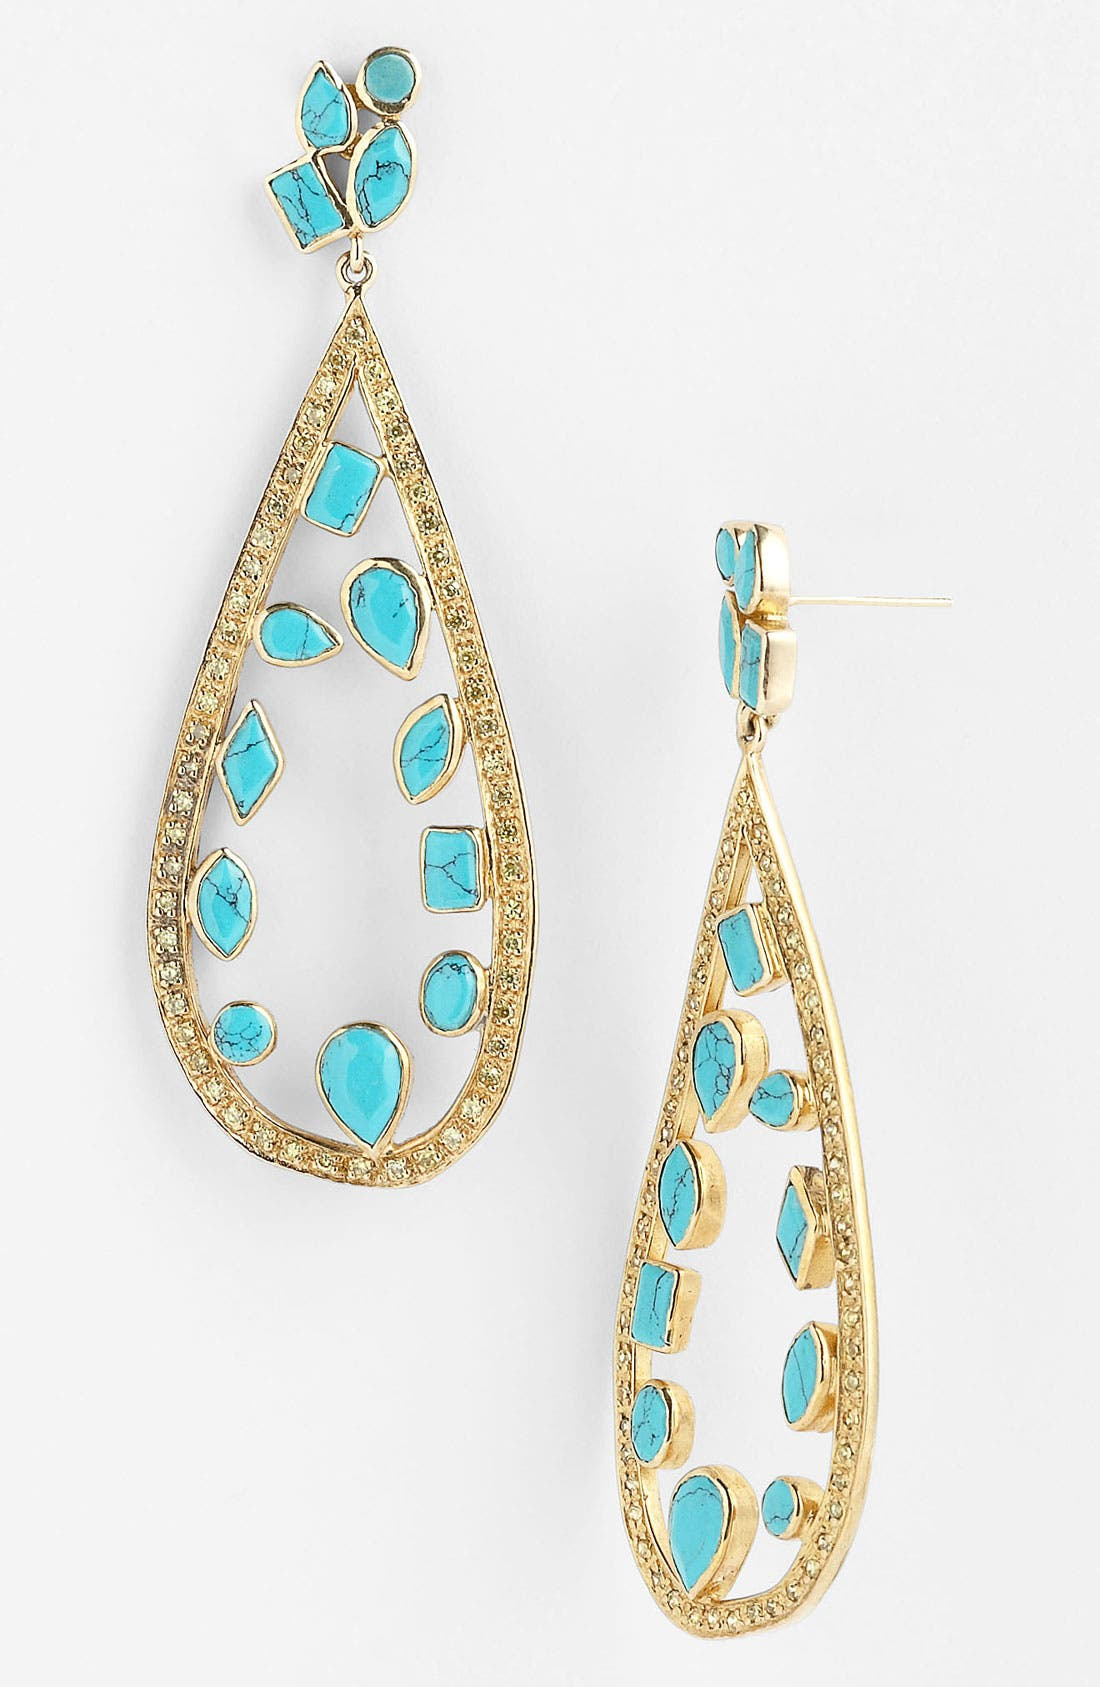 Main Image - Melinda Maria 'Floating Mosaic' Open Teardrop Earrings